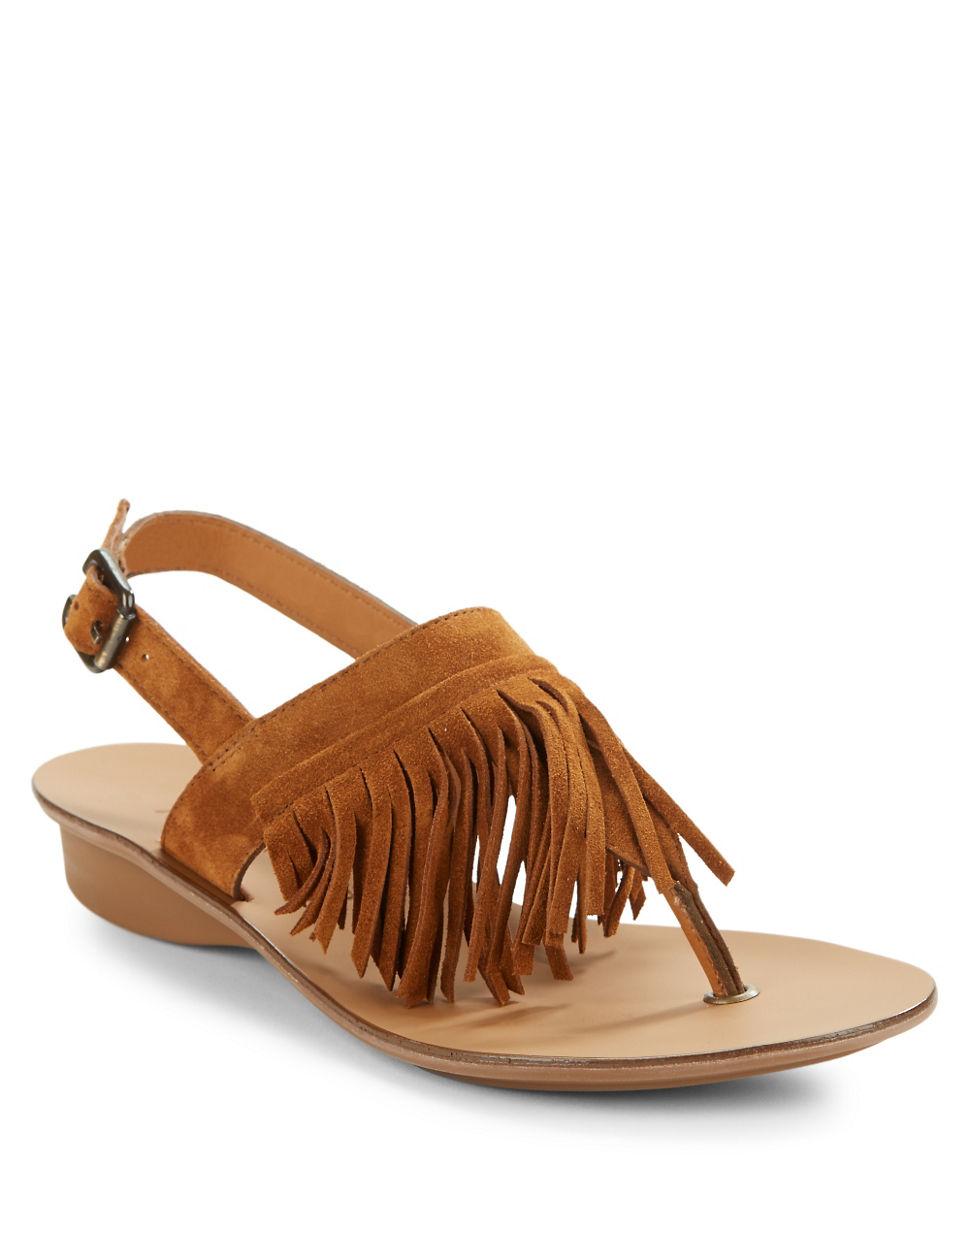 lyst paul green havana suede sandals in brown. Black Bedroom Furniture Sets. Home Design Ideas